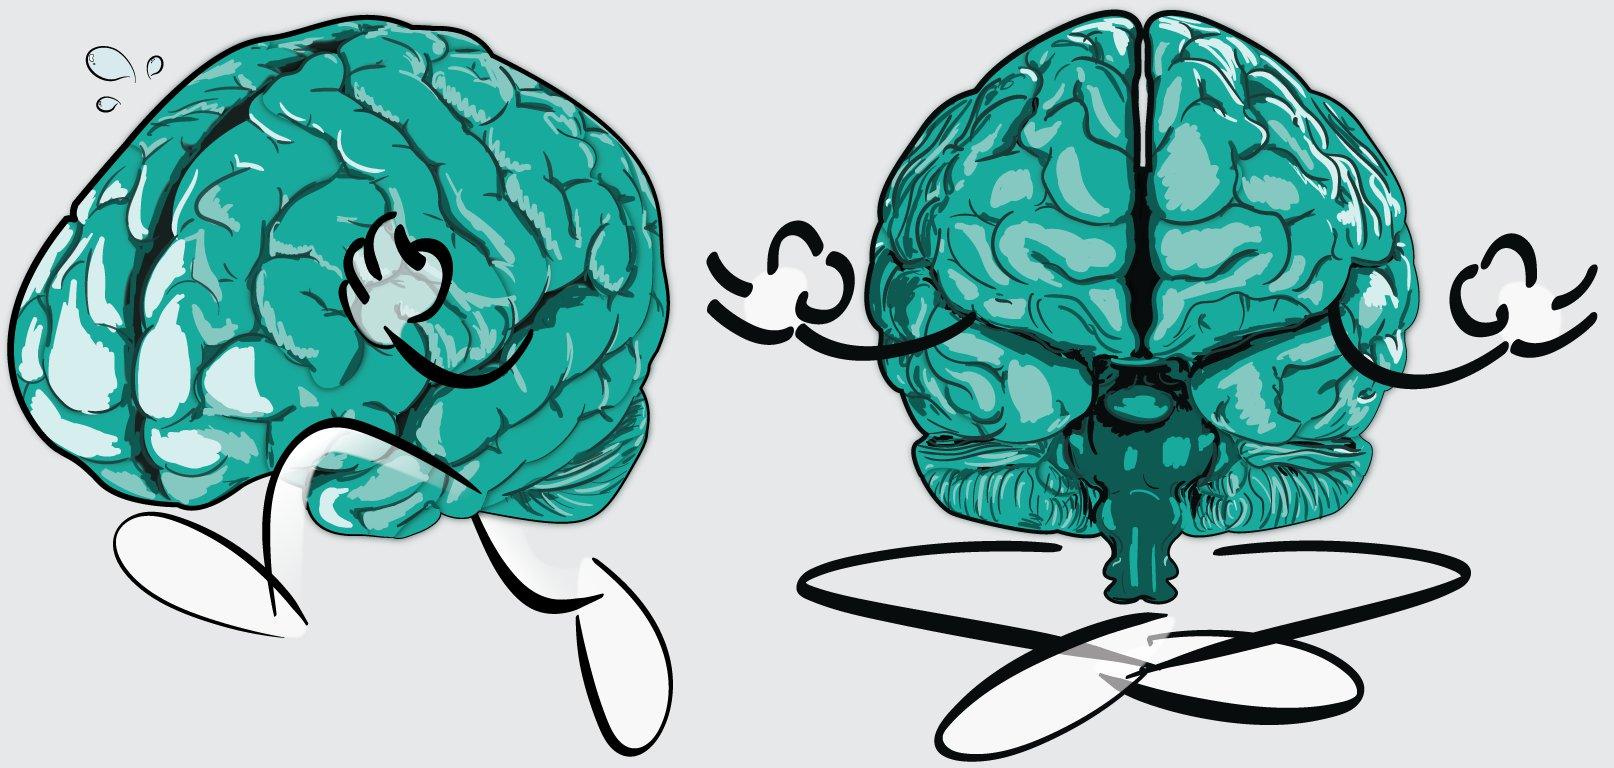 MindCise Brains